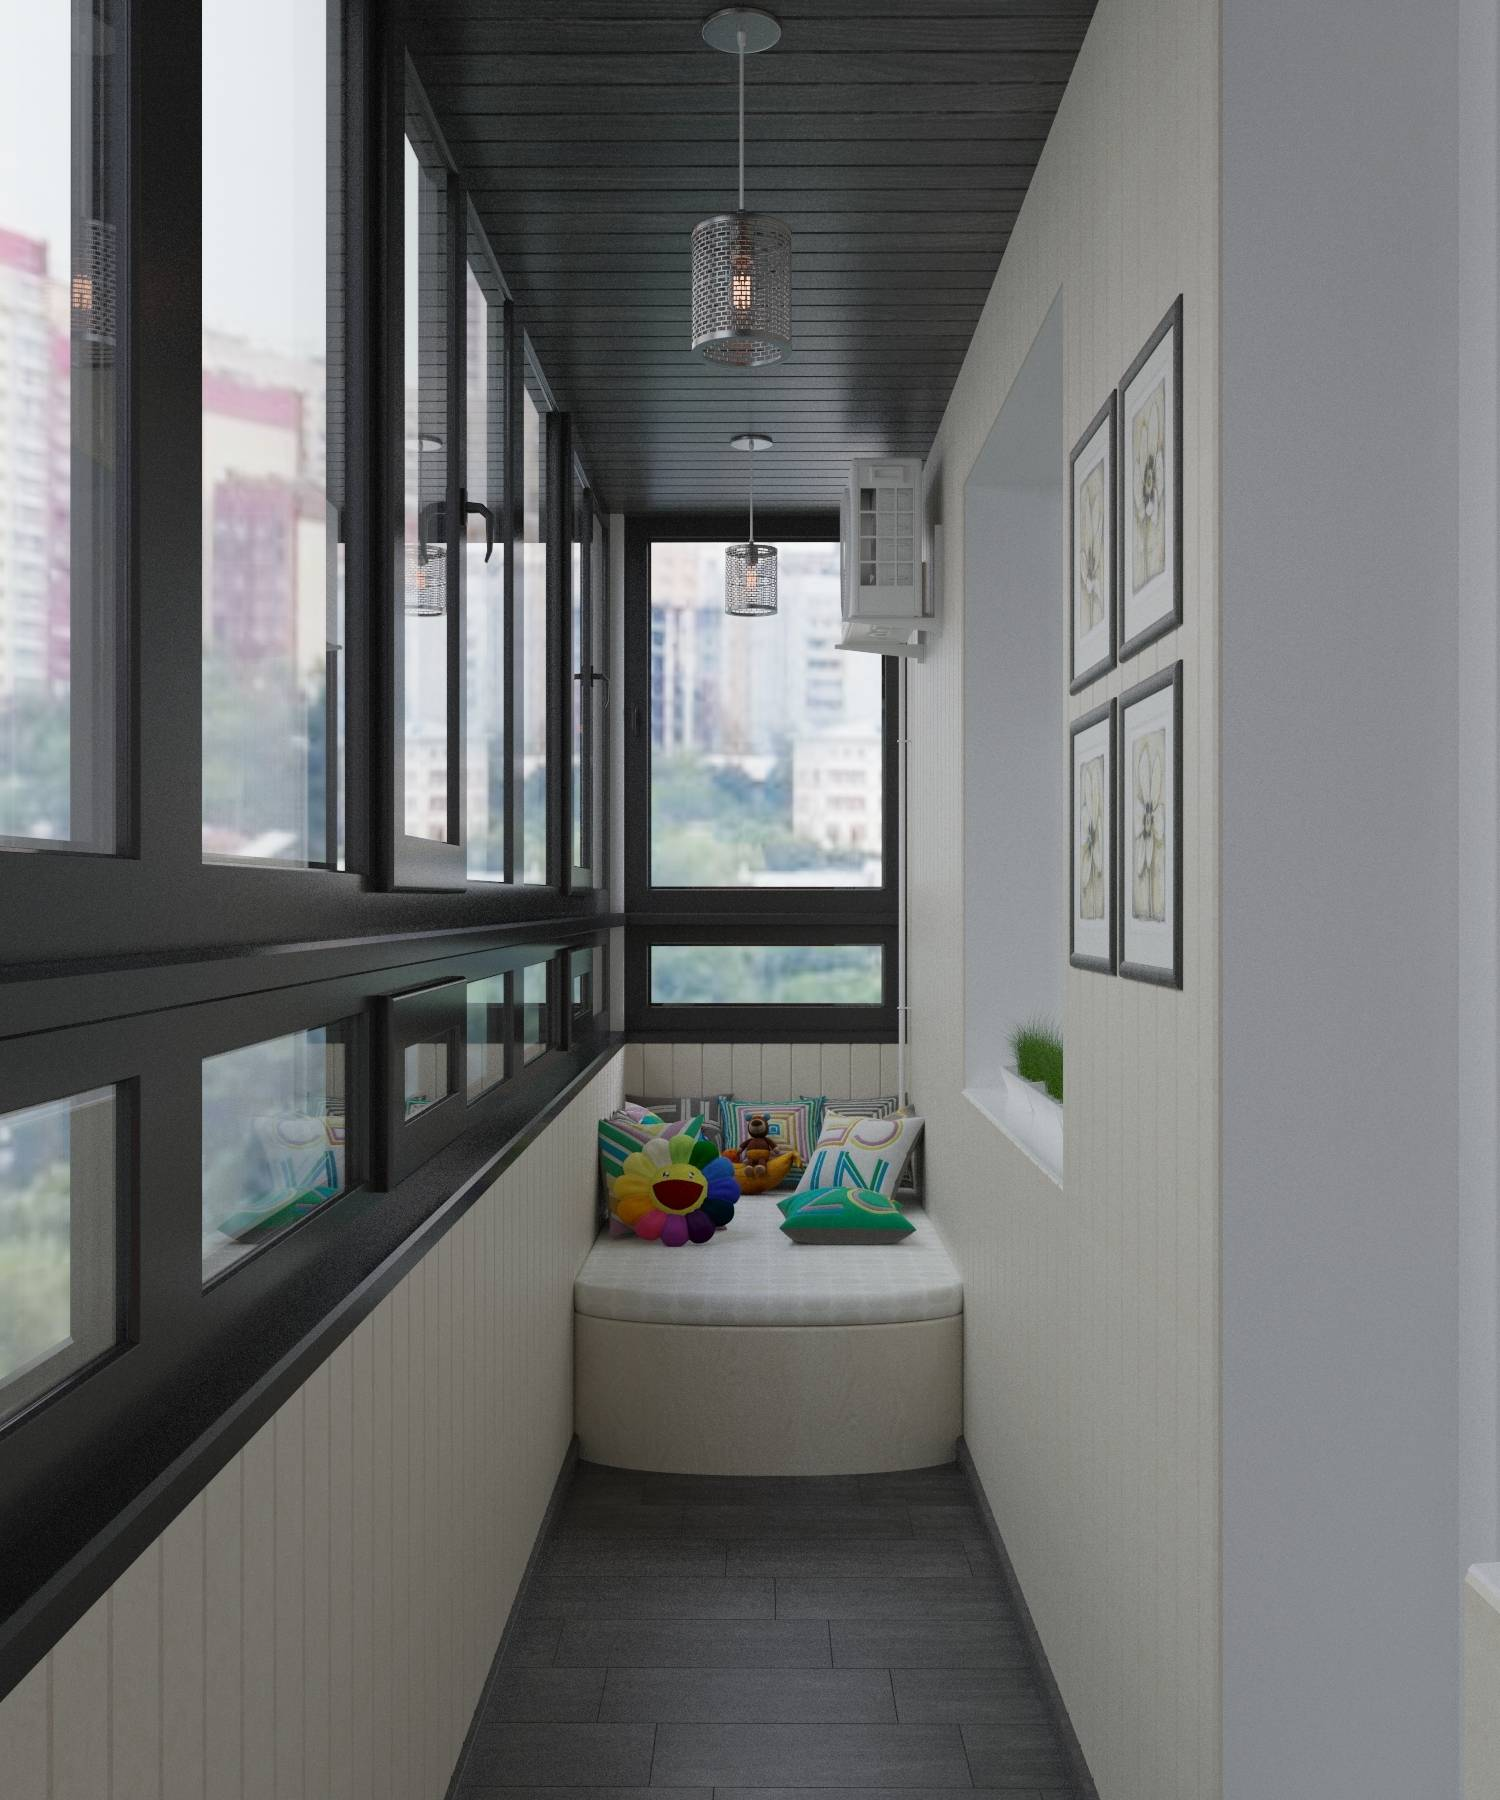 двухкомнатная квартира в Новосибирске